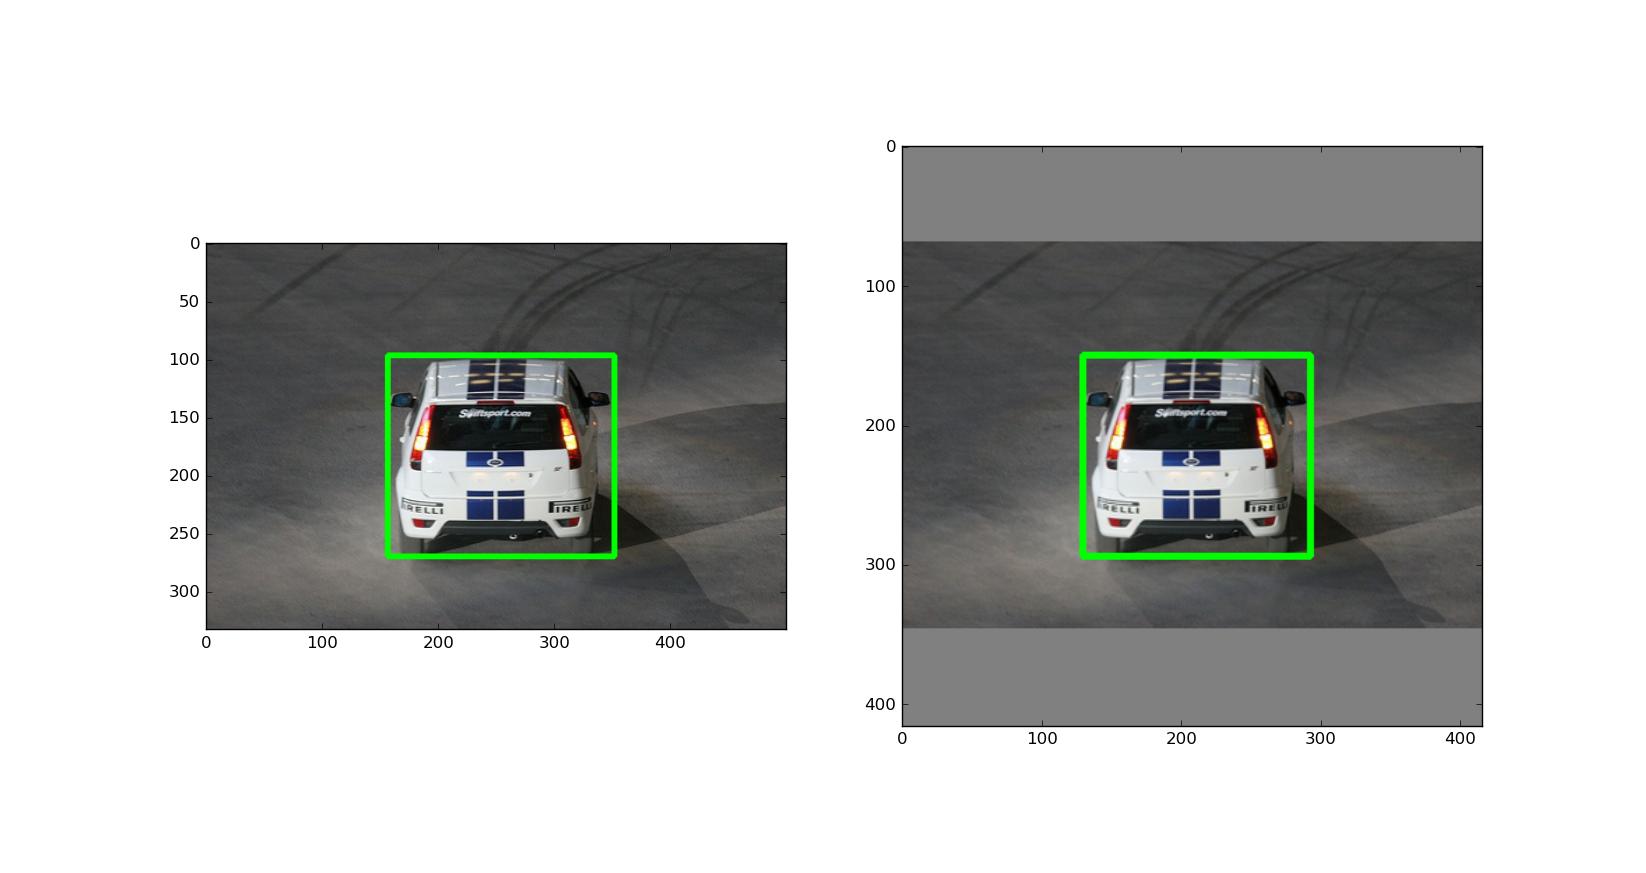 GitHub - maiminh1996/YOLOv3-tensorflow: Implement YOLOv3 with TensorFlow